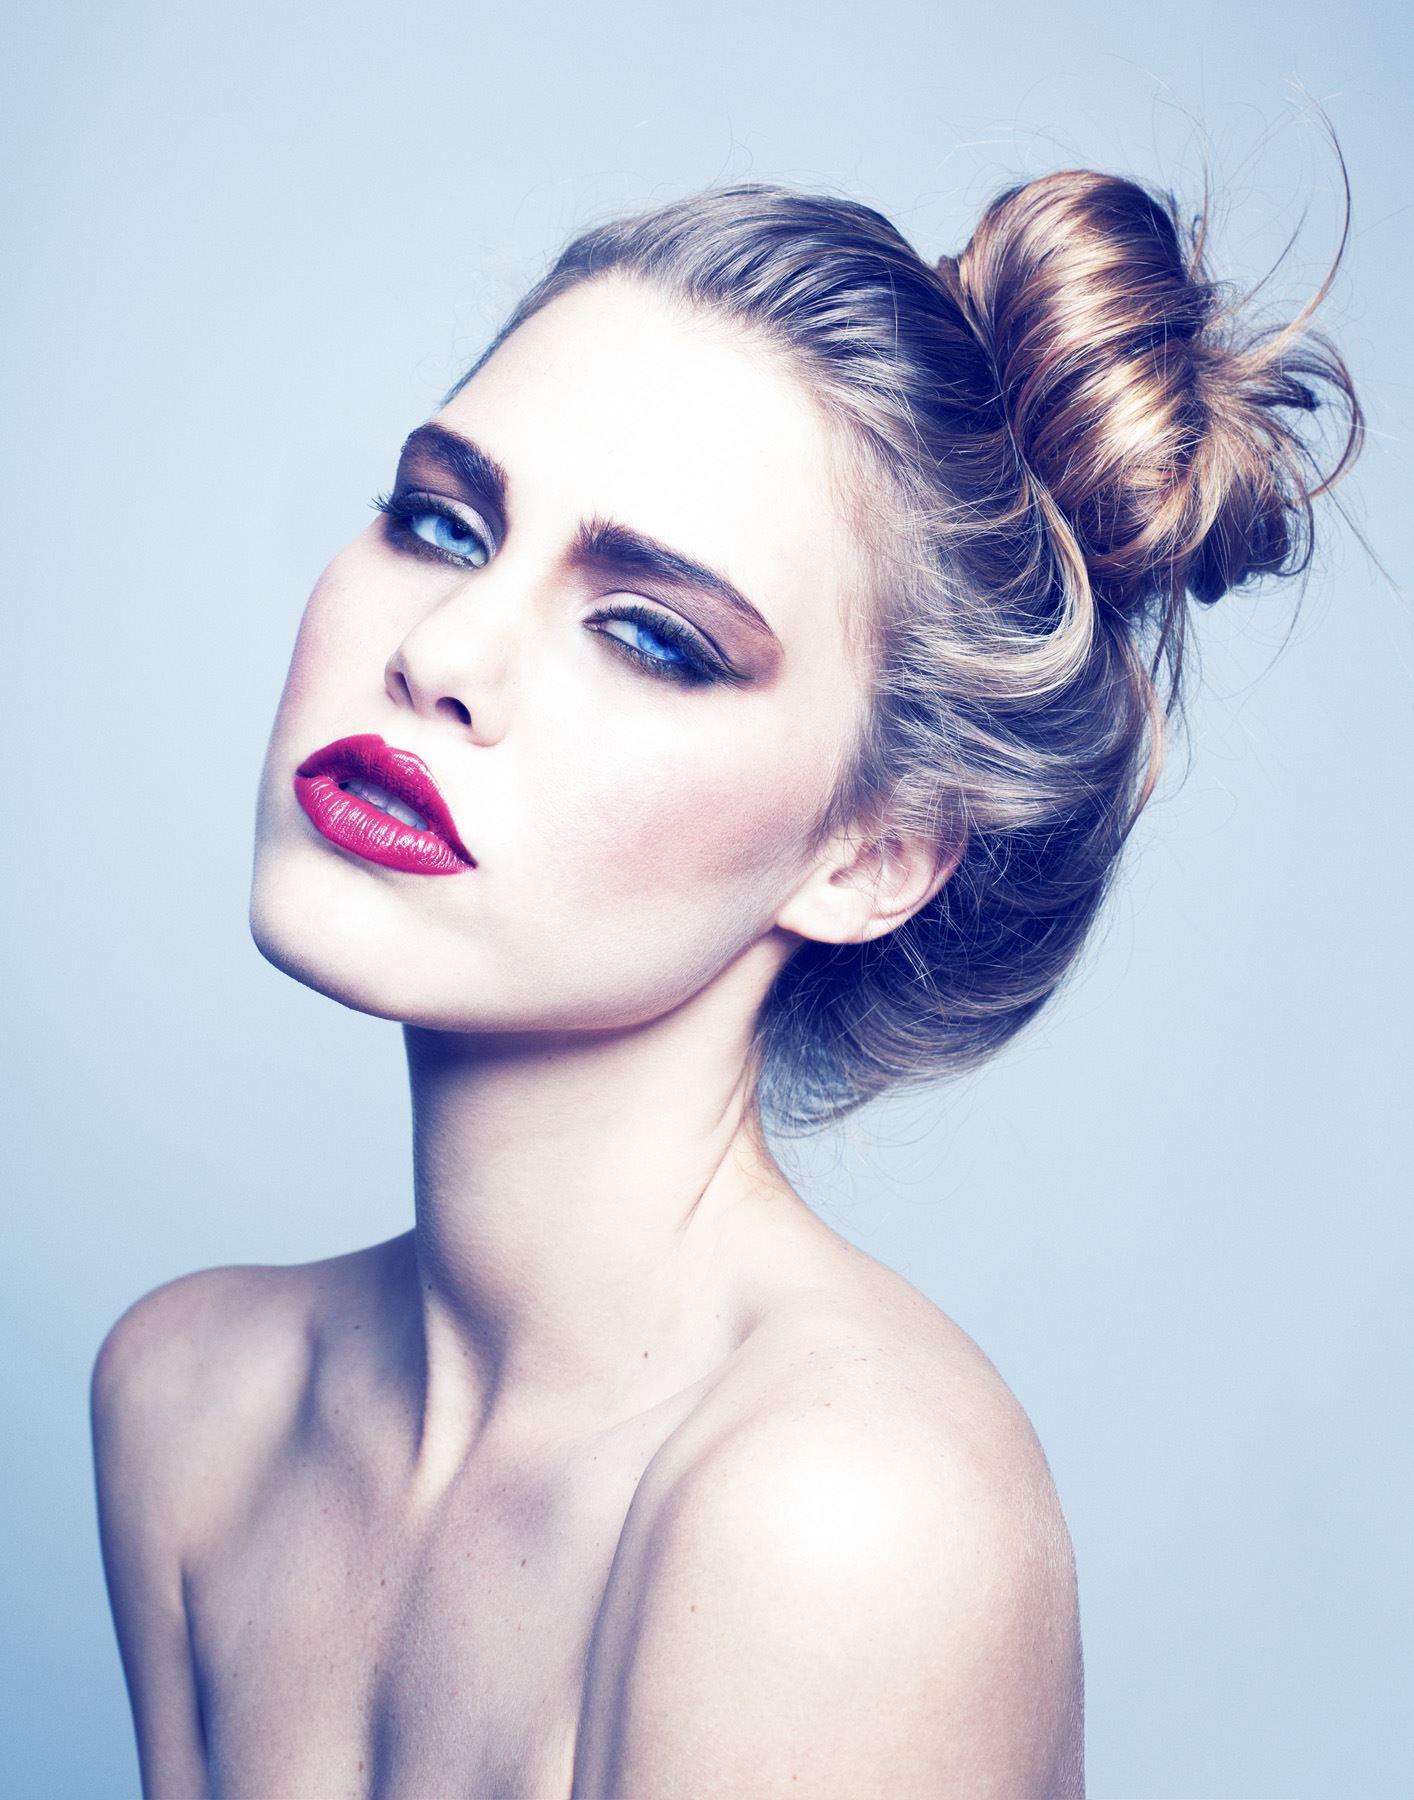 Orlando Photographer & Makeup Artist